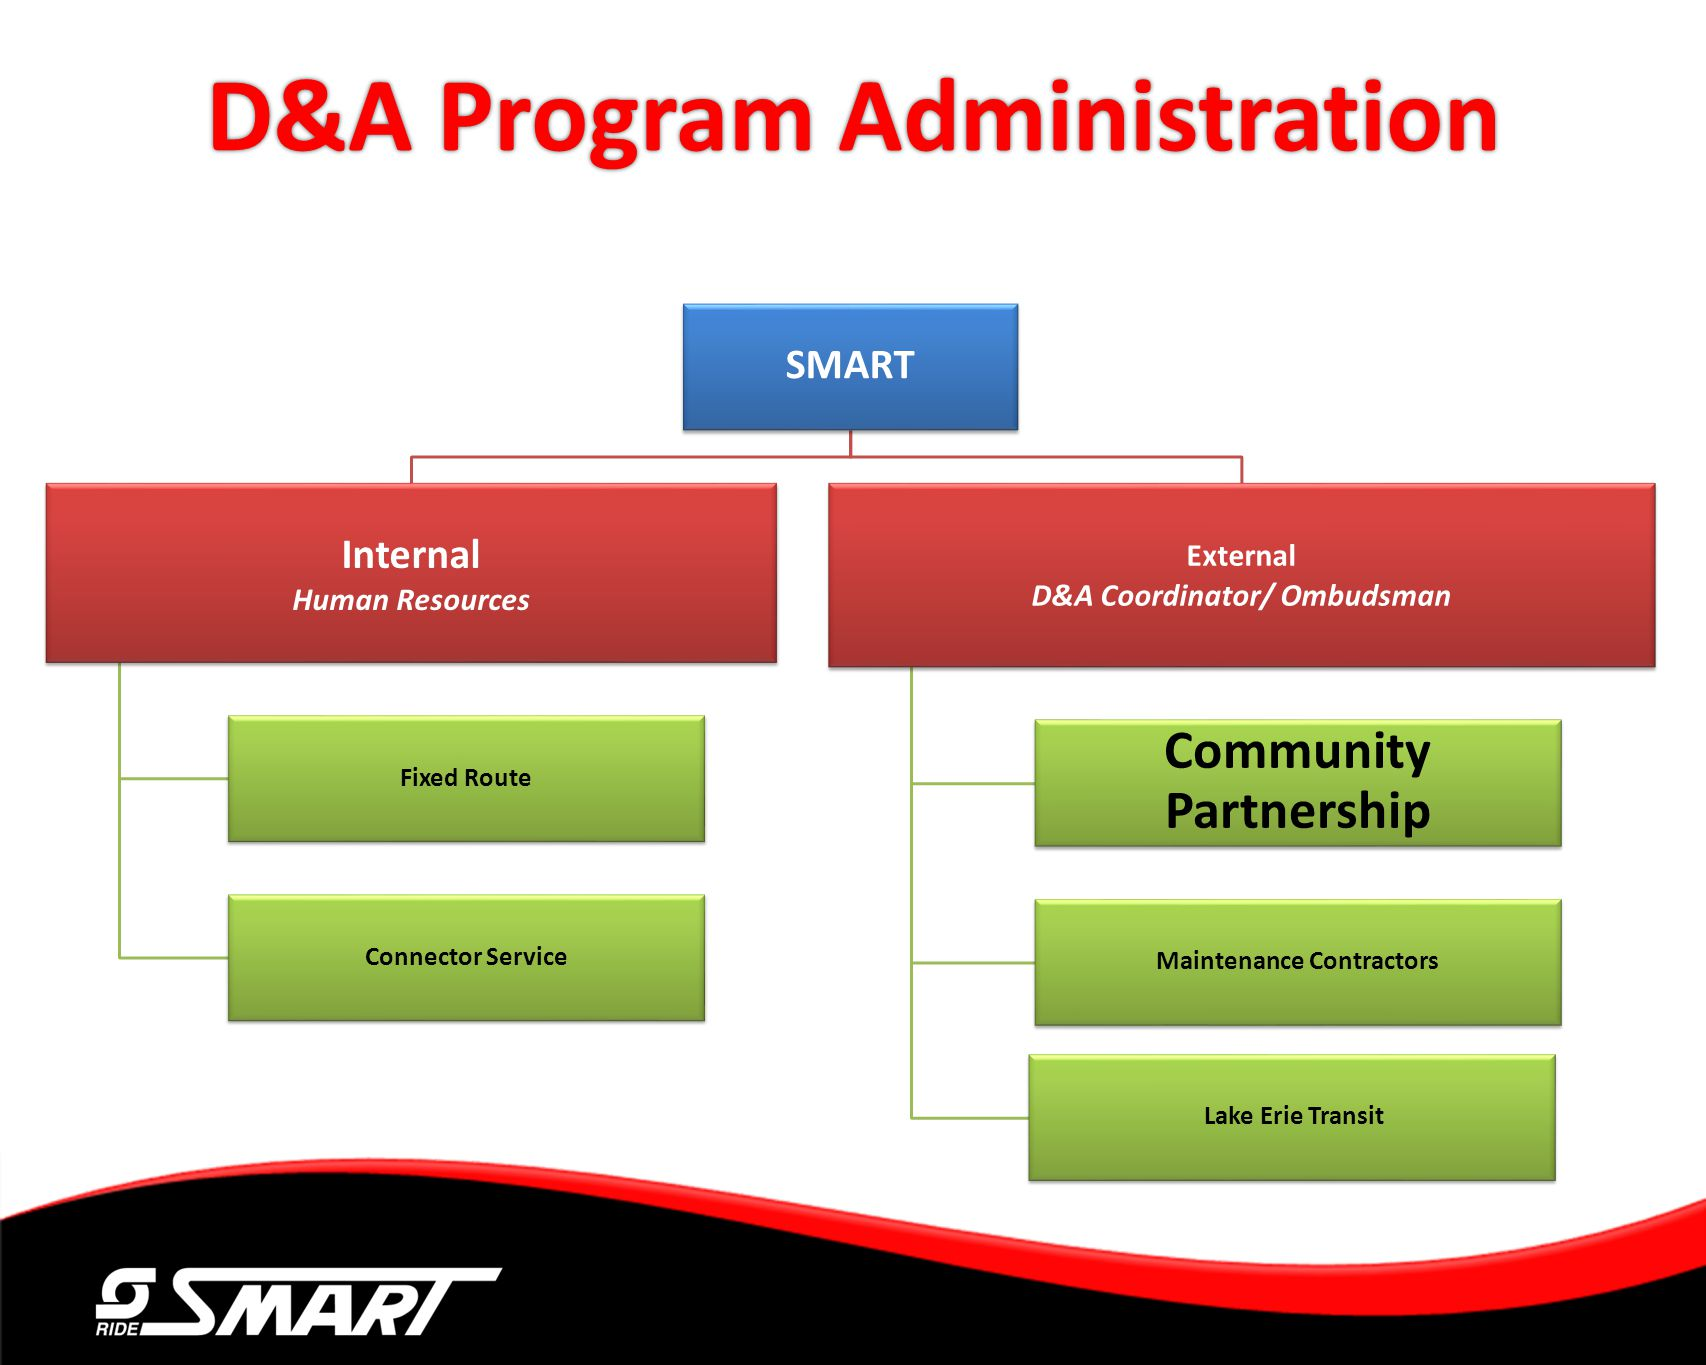 D&A Program Administration